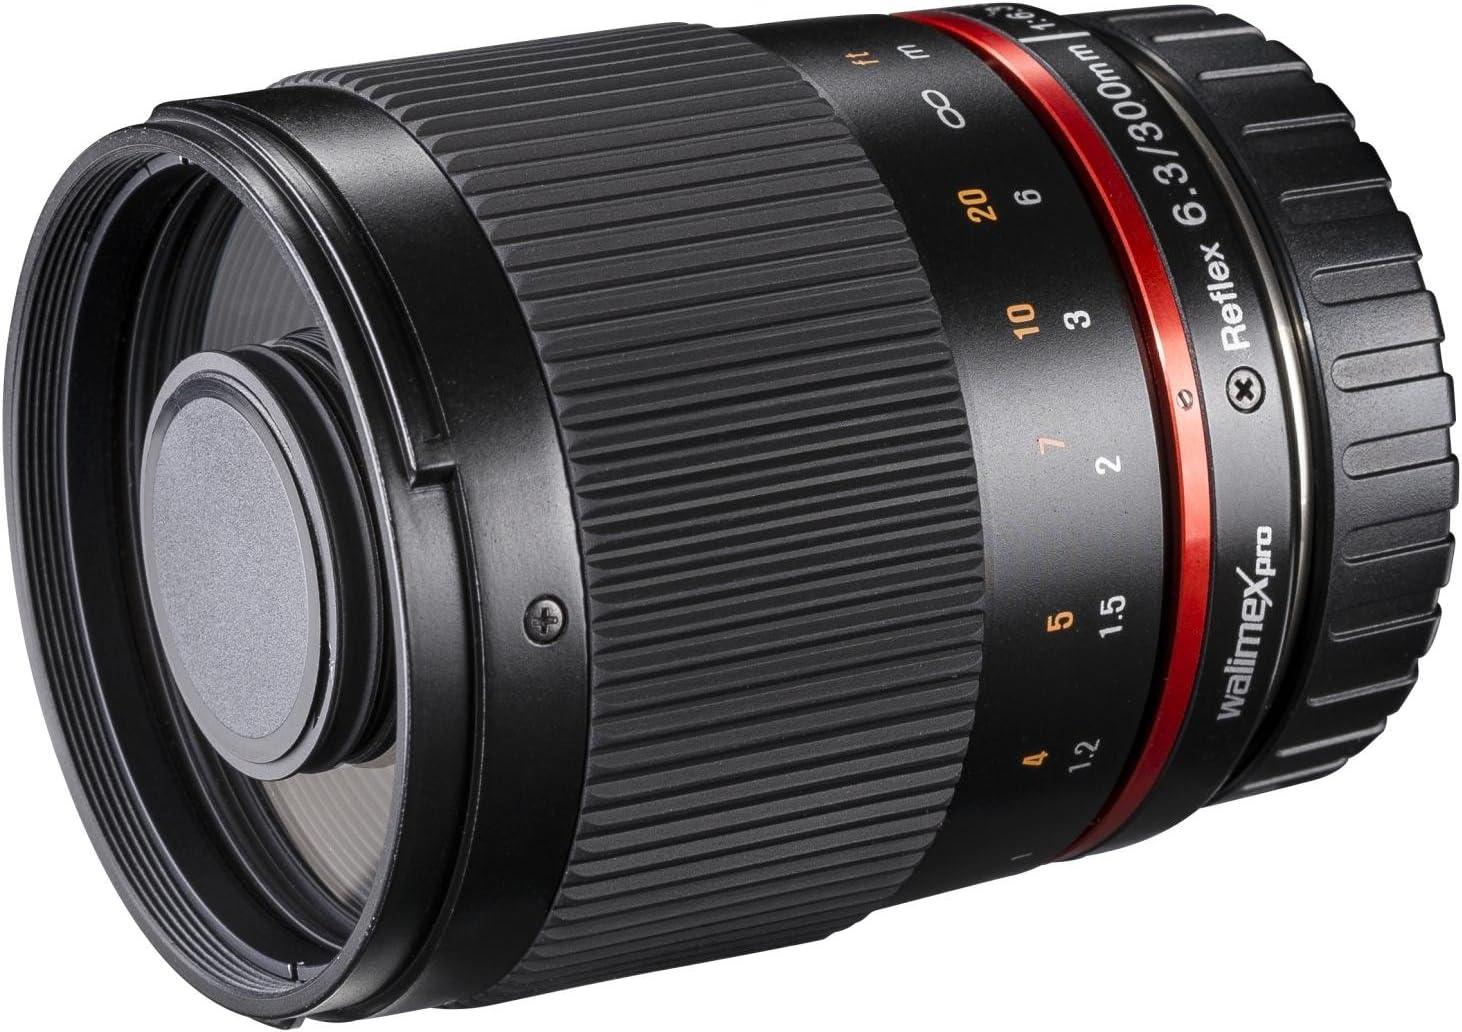 Walimex Pro 300mm 1 6 3 Objektiv Für Sony E Mount Kamera